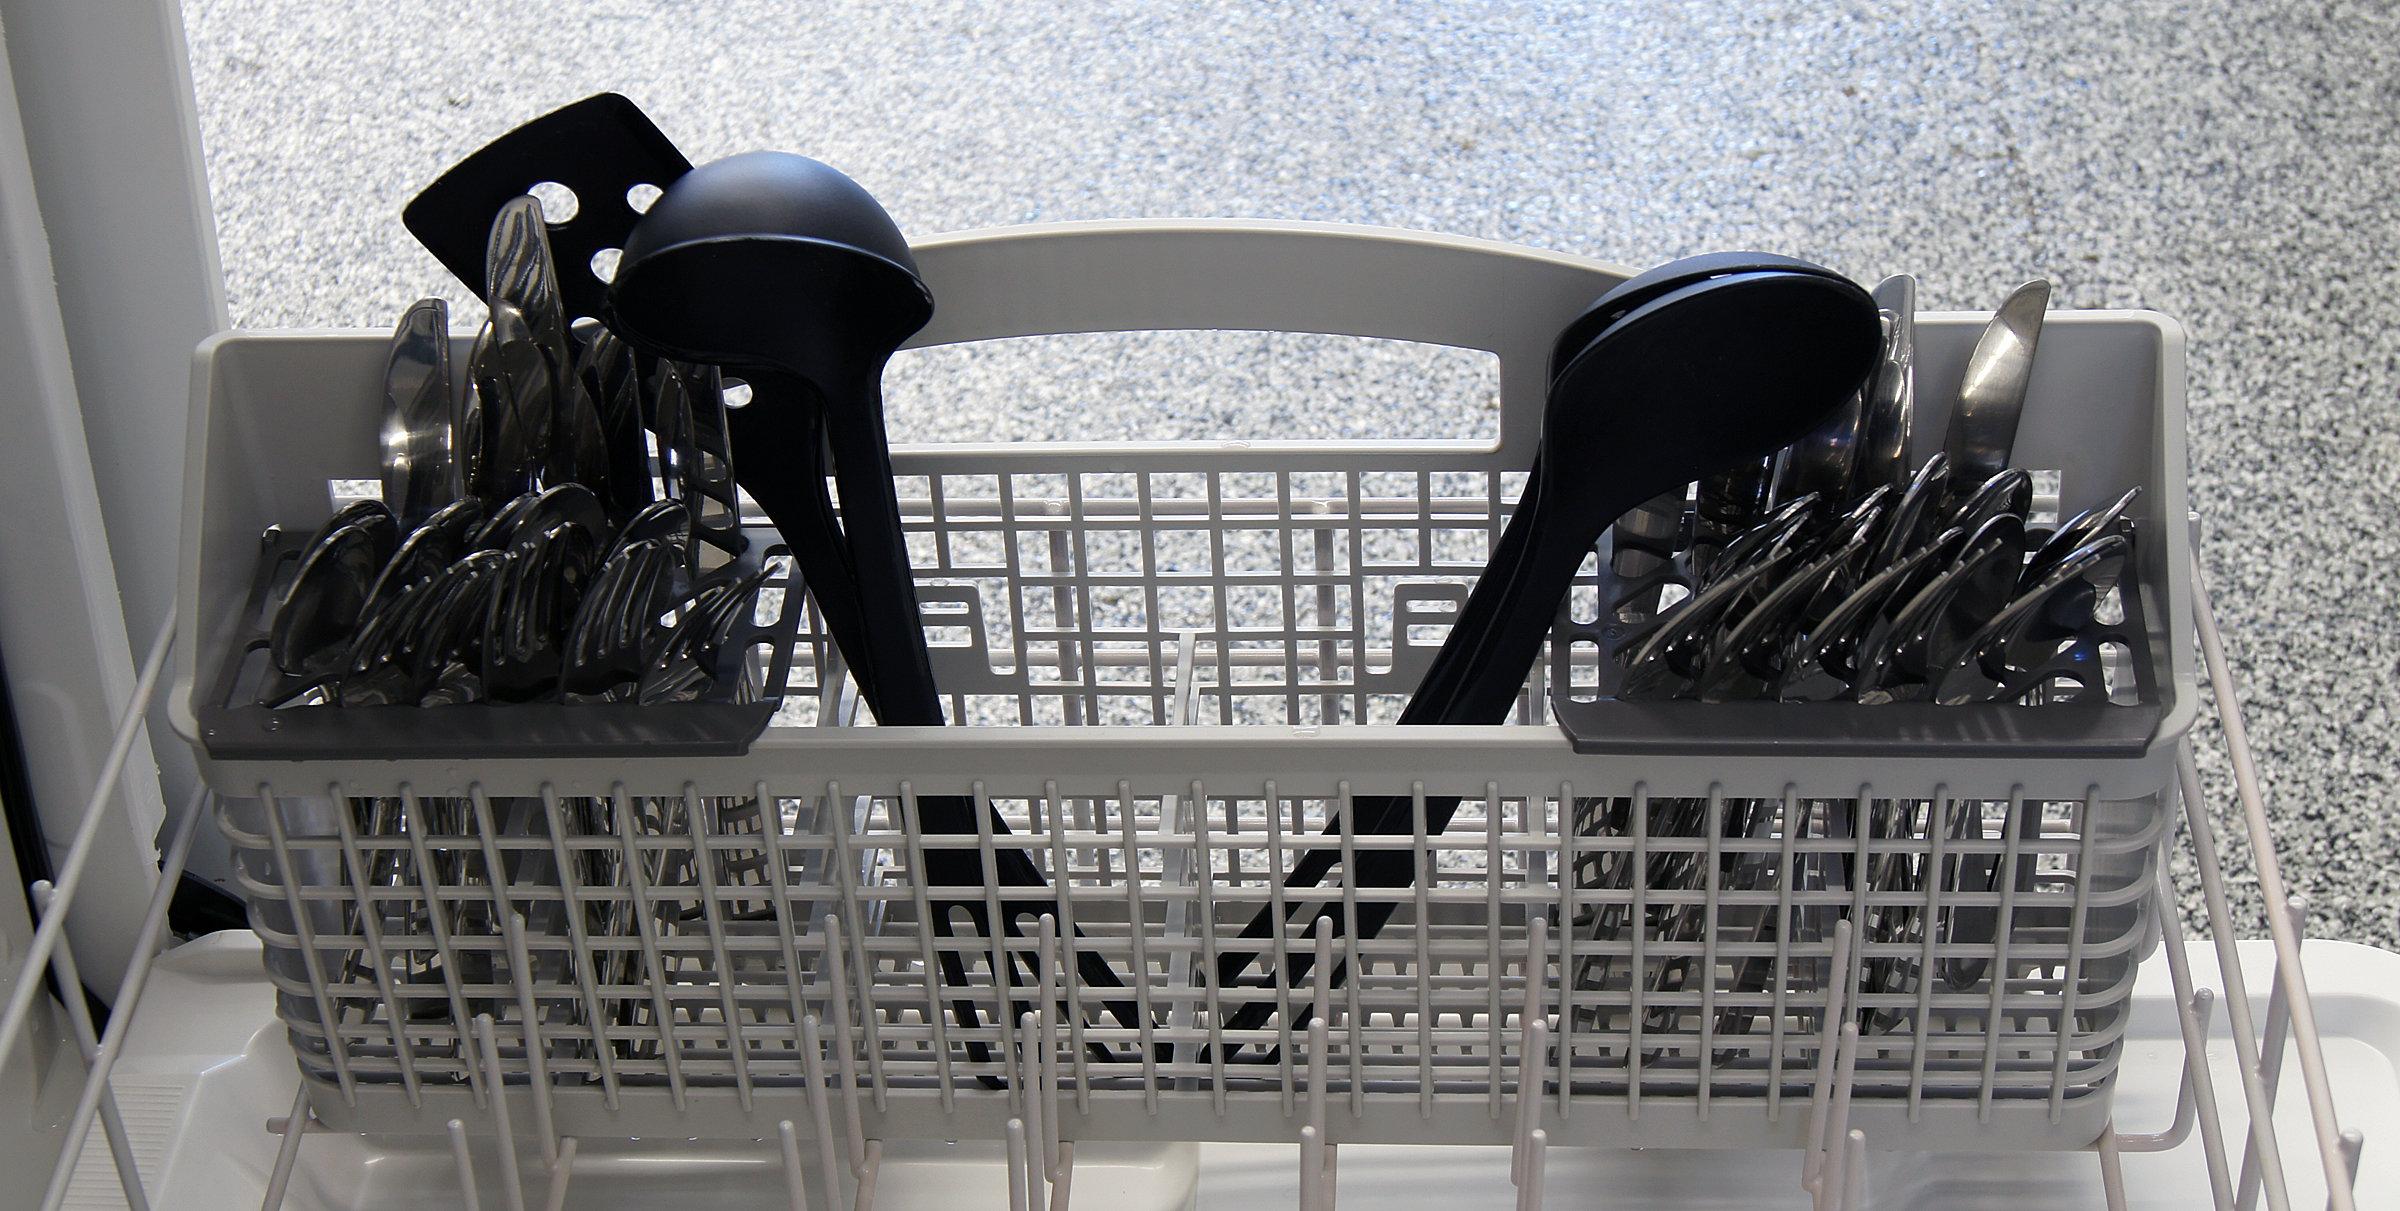 Kenmore 15113 cutlery basket capacity